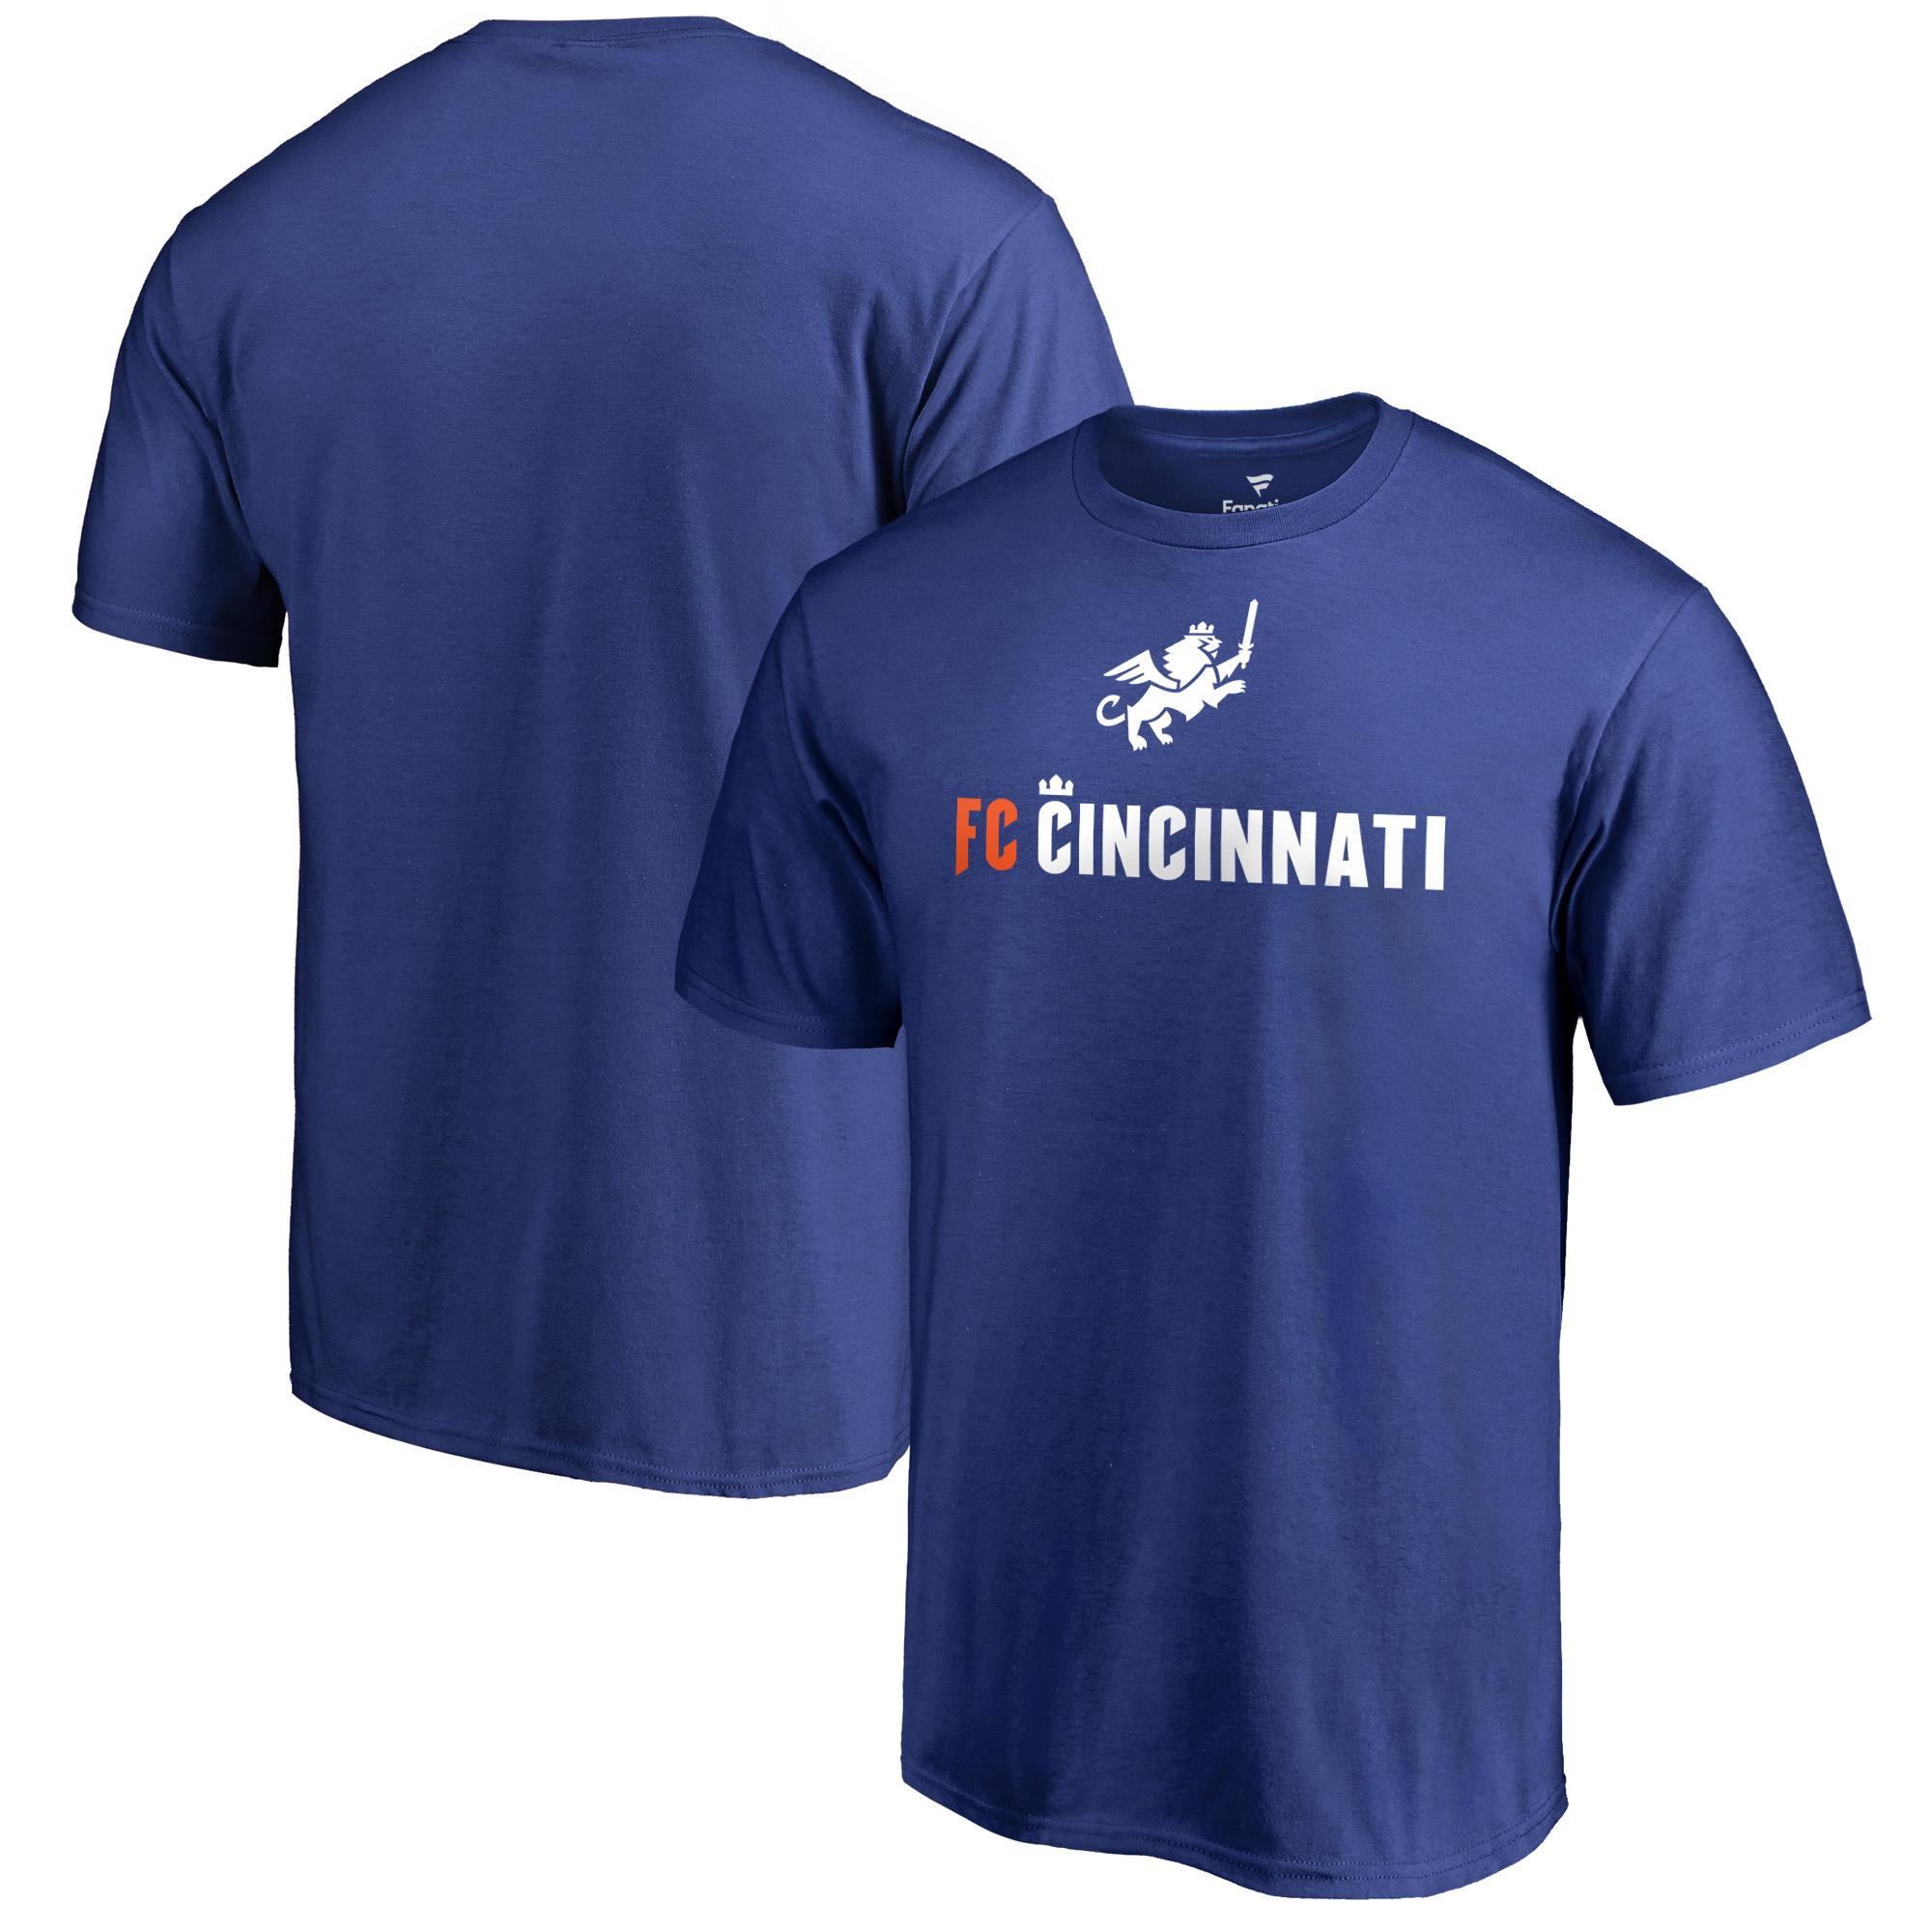 FC Cincinnati Fanatics Branded Victory Arch Big & Tall T-Shirt - Royal